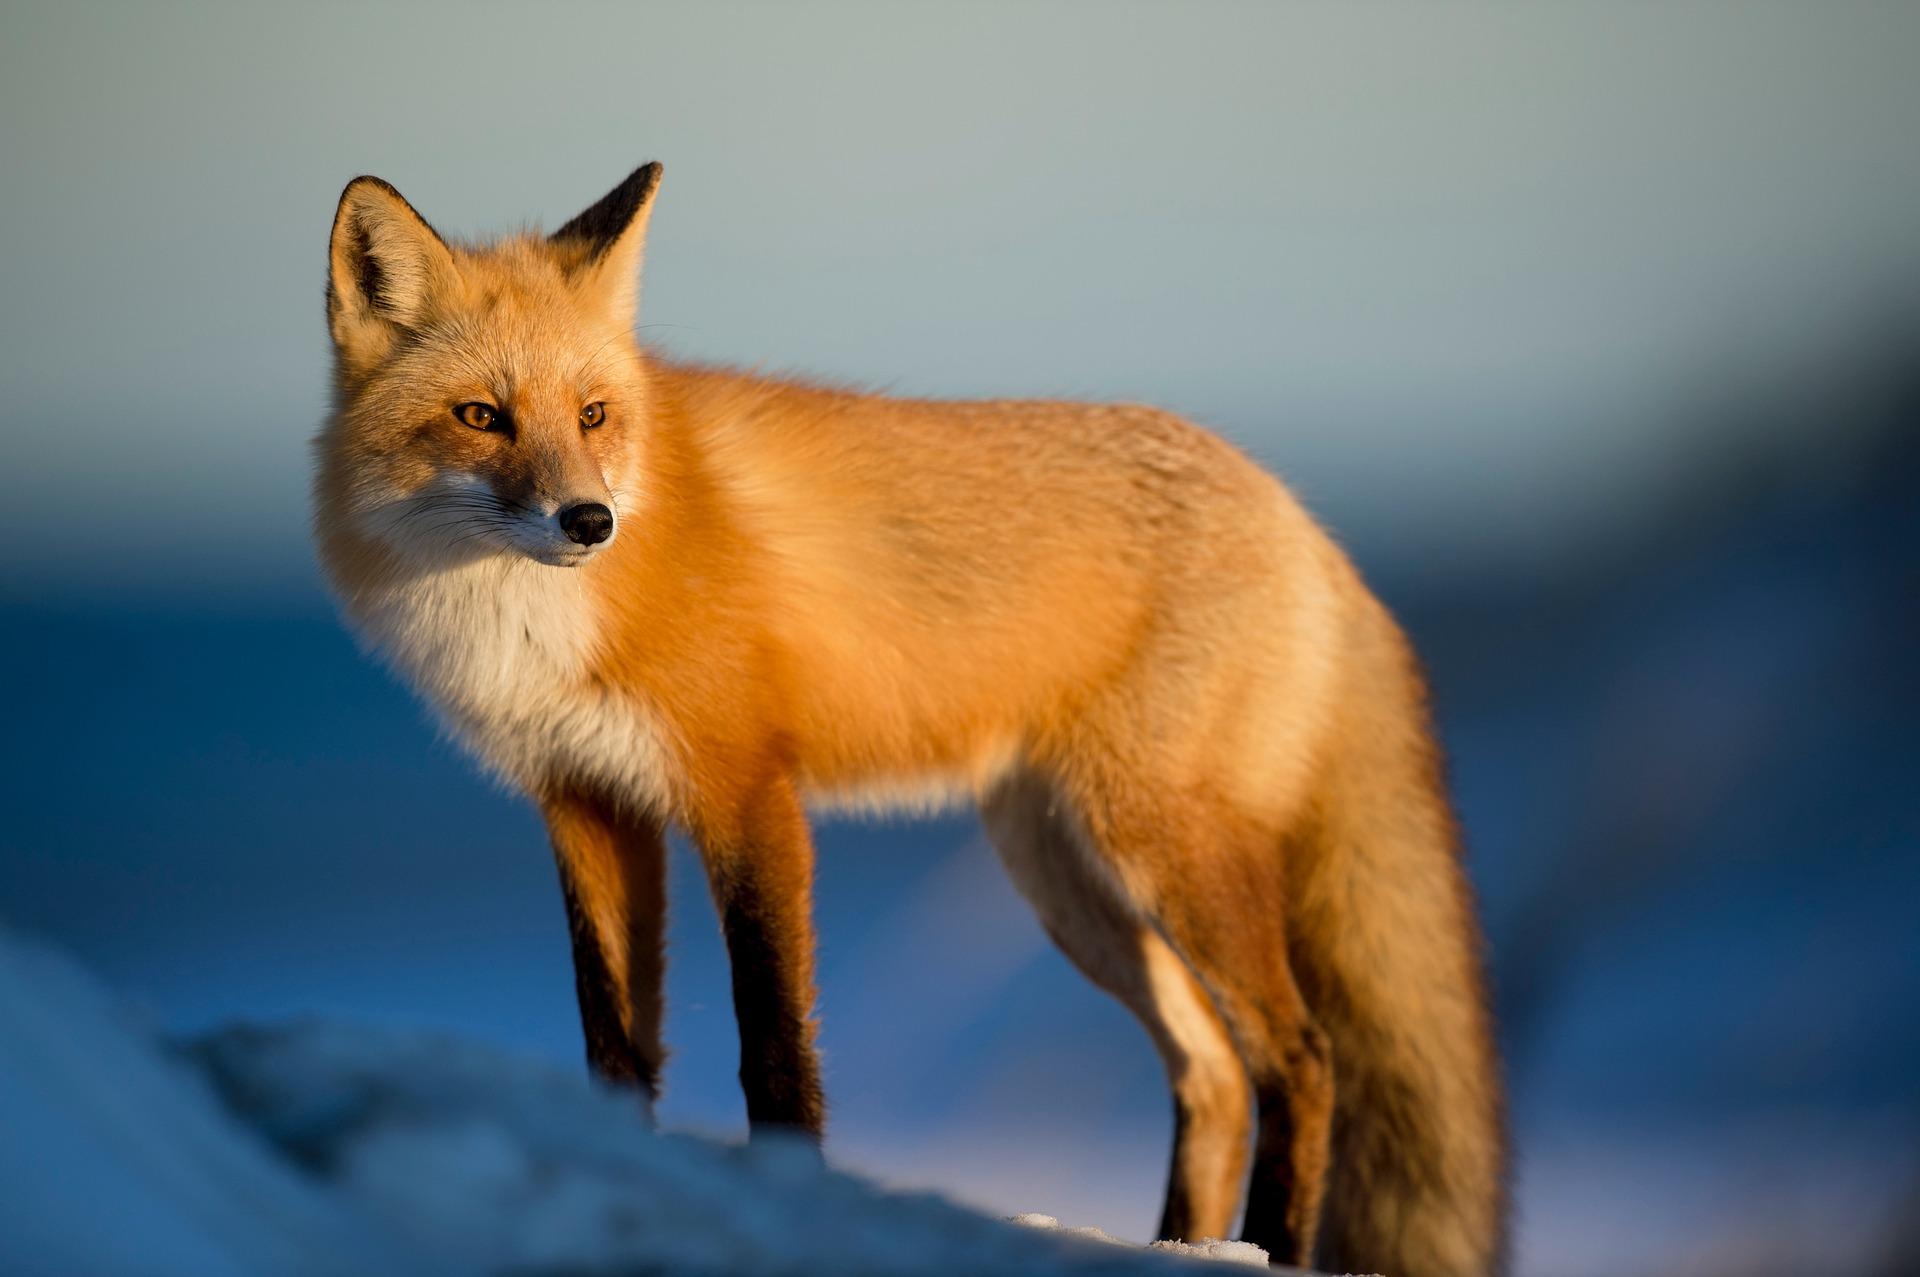 fox-2597803_1920 by StockSnap on Pixabay